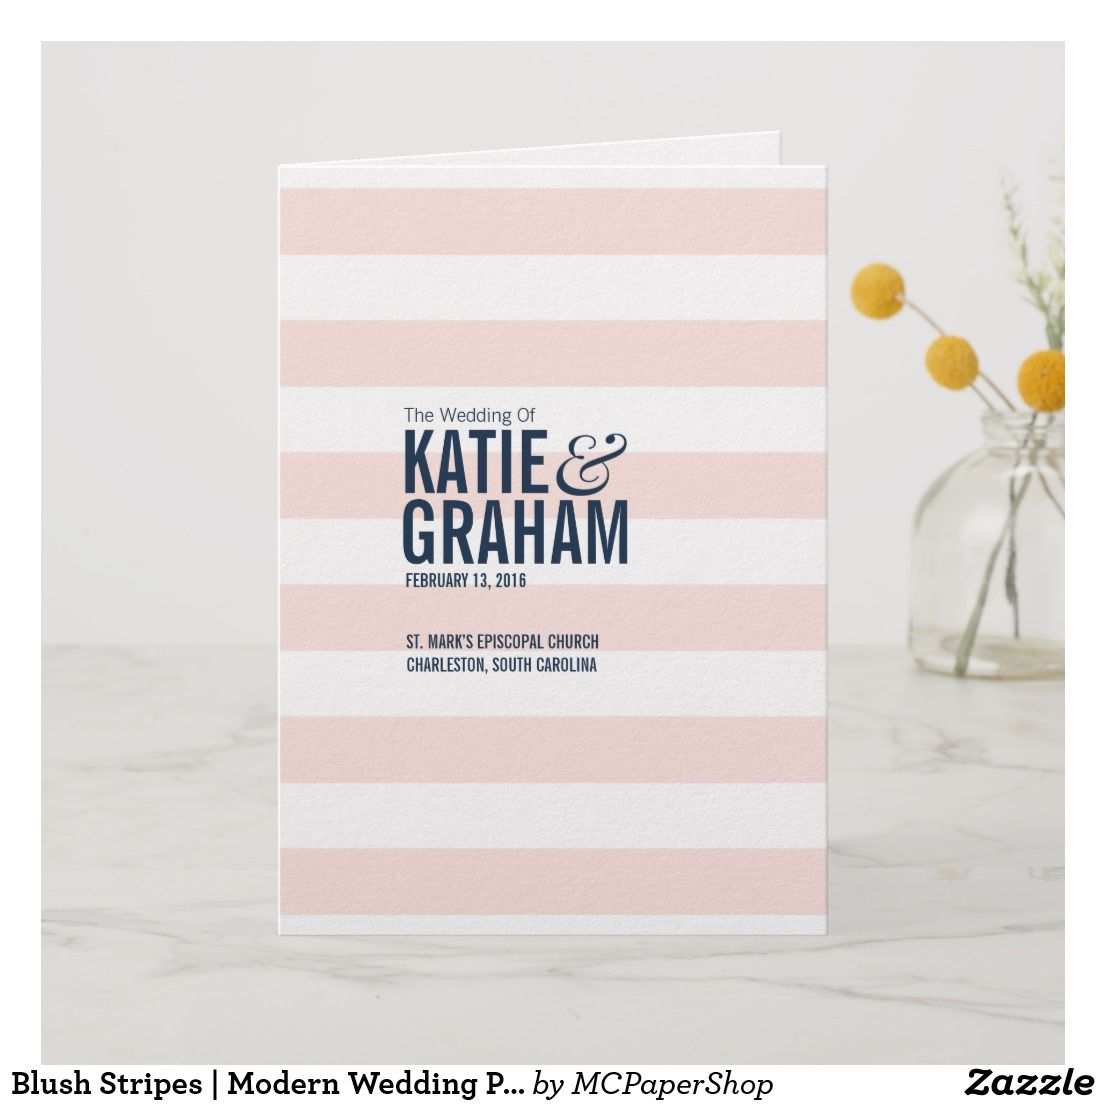 Blush Stripes Modern Wedding Program Zazzle Com Wedding Modern Modern Wedding Program Wedding Programs